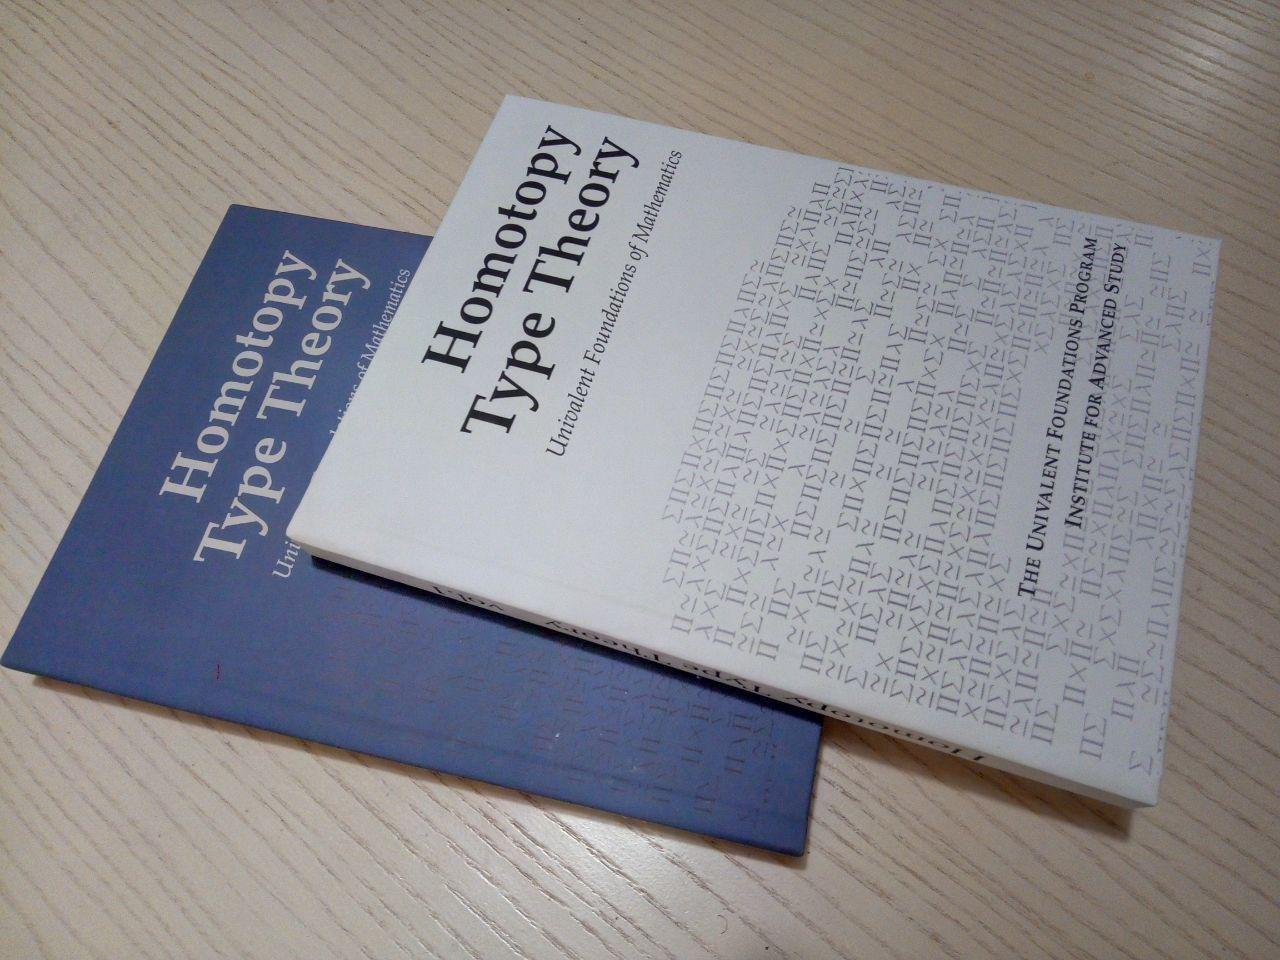 Homotopy Type Theory (HoTT) Vol. 1, 2